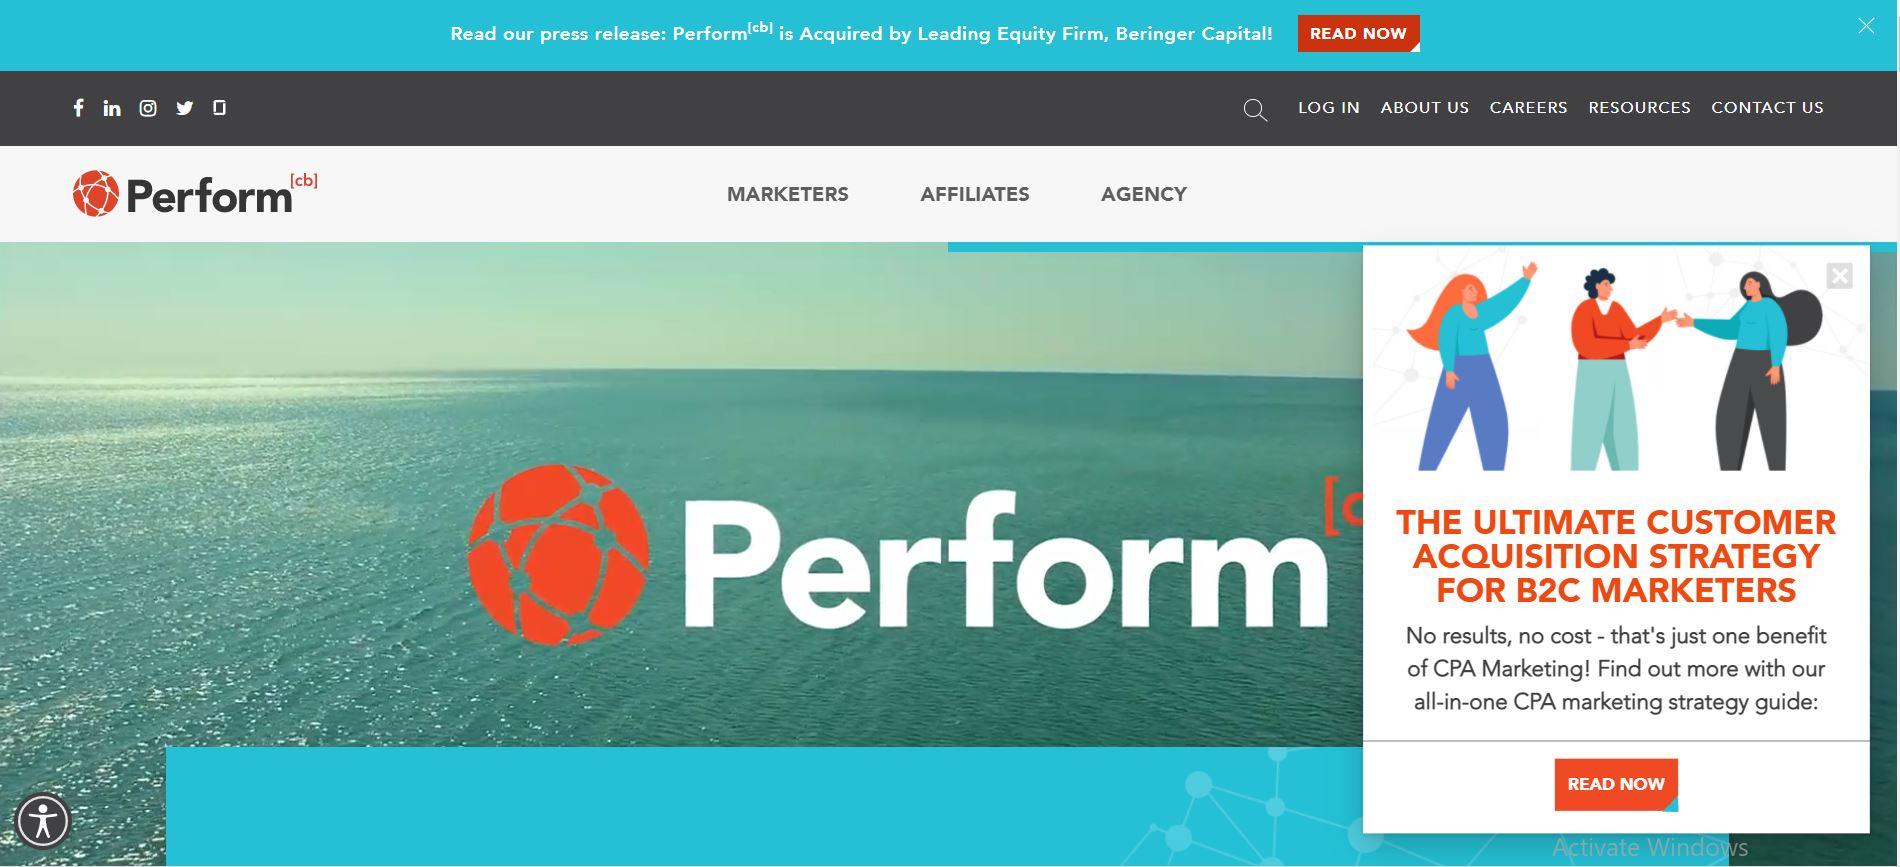 CPA Marketing Network #3. PerformCB